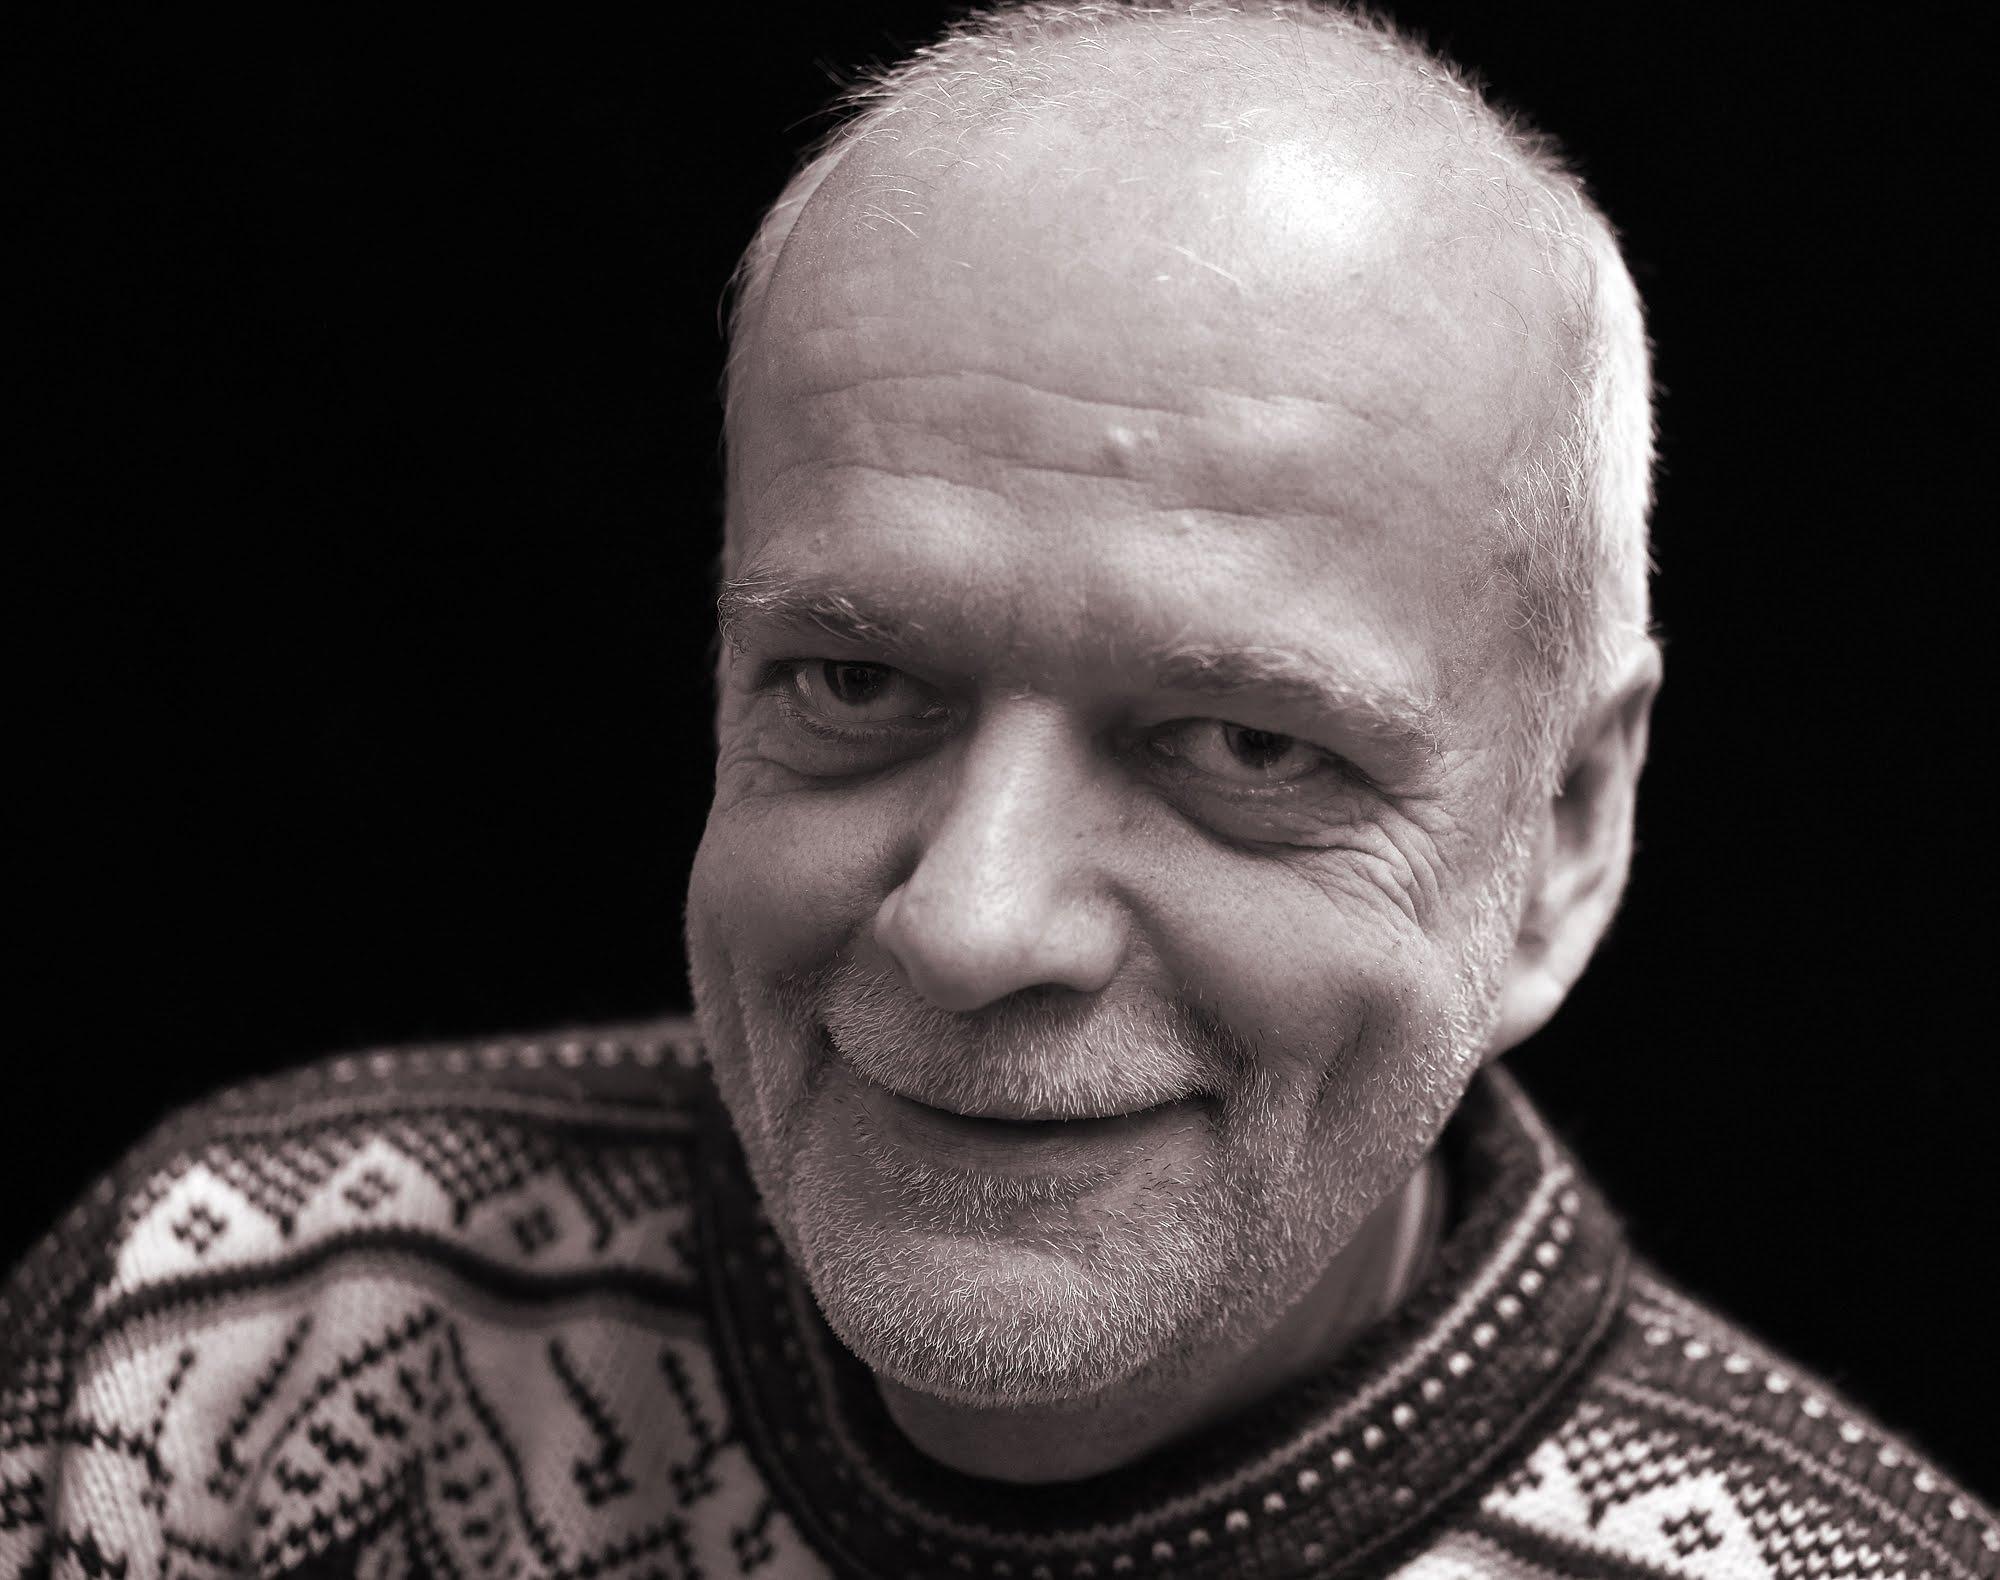 Norbert Poepelau